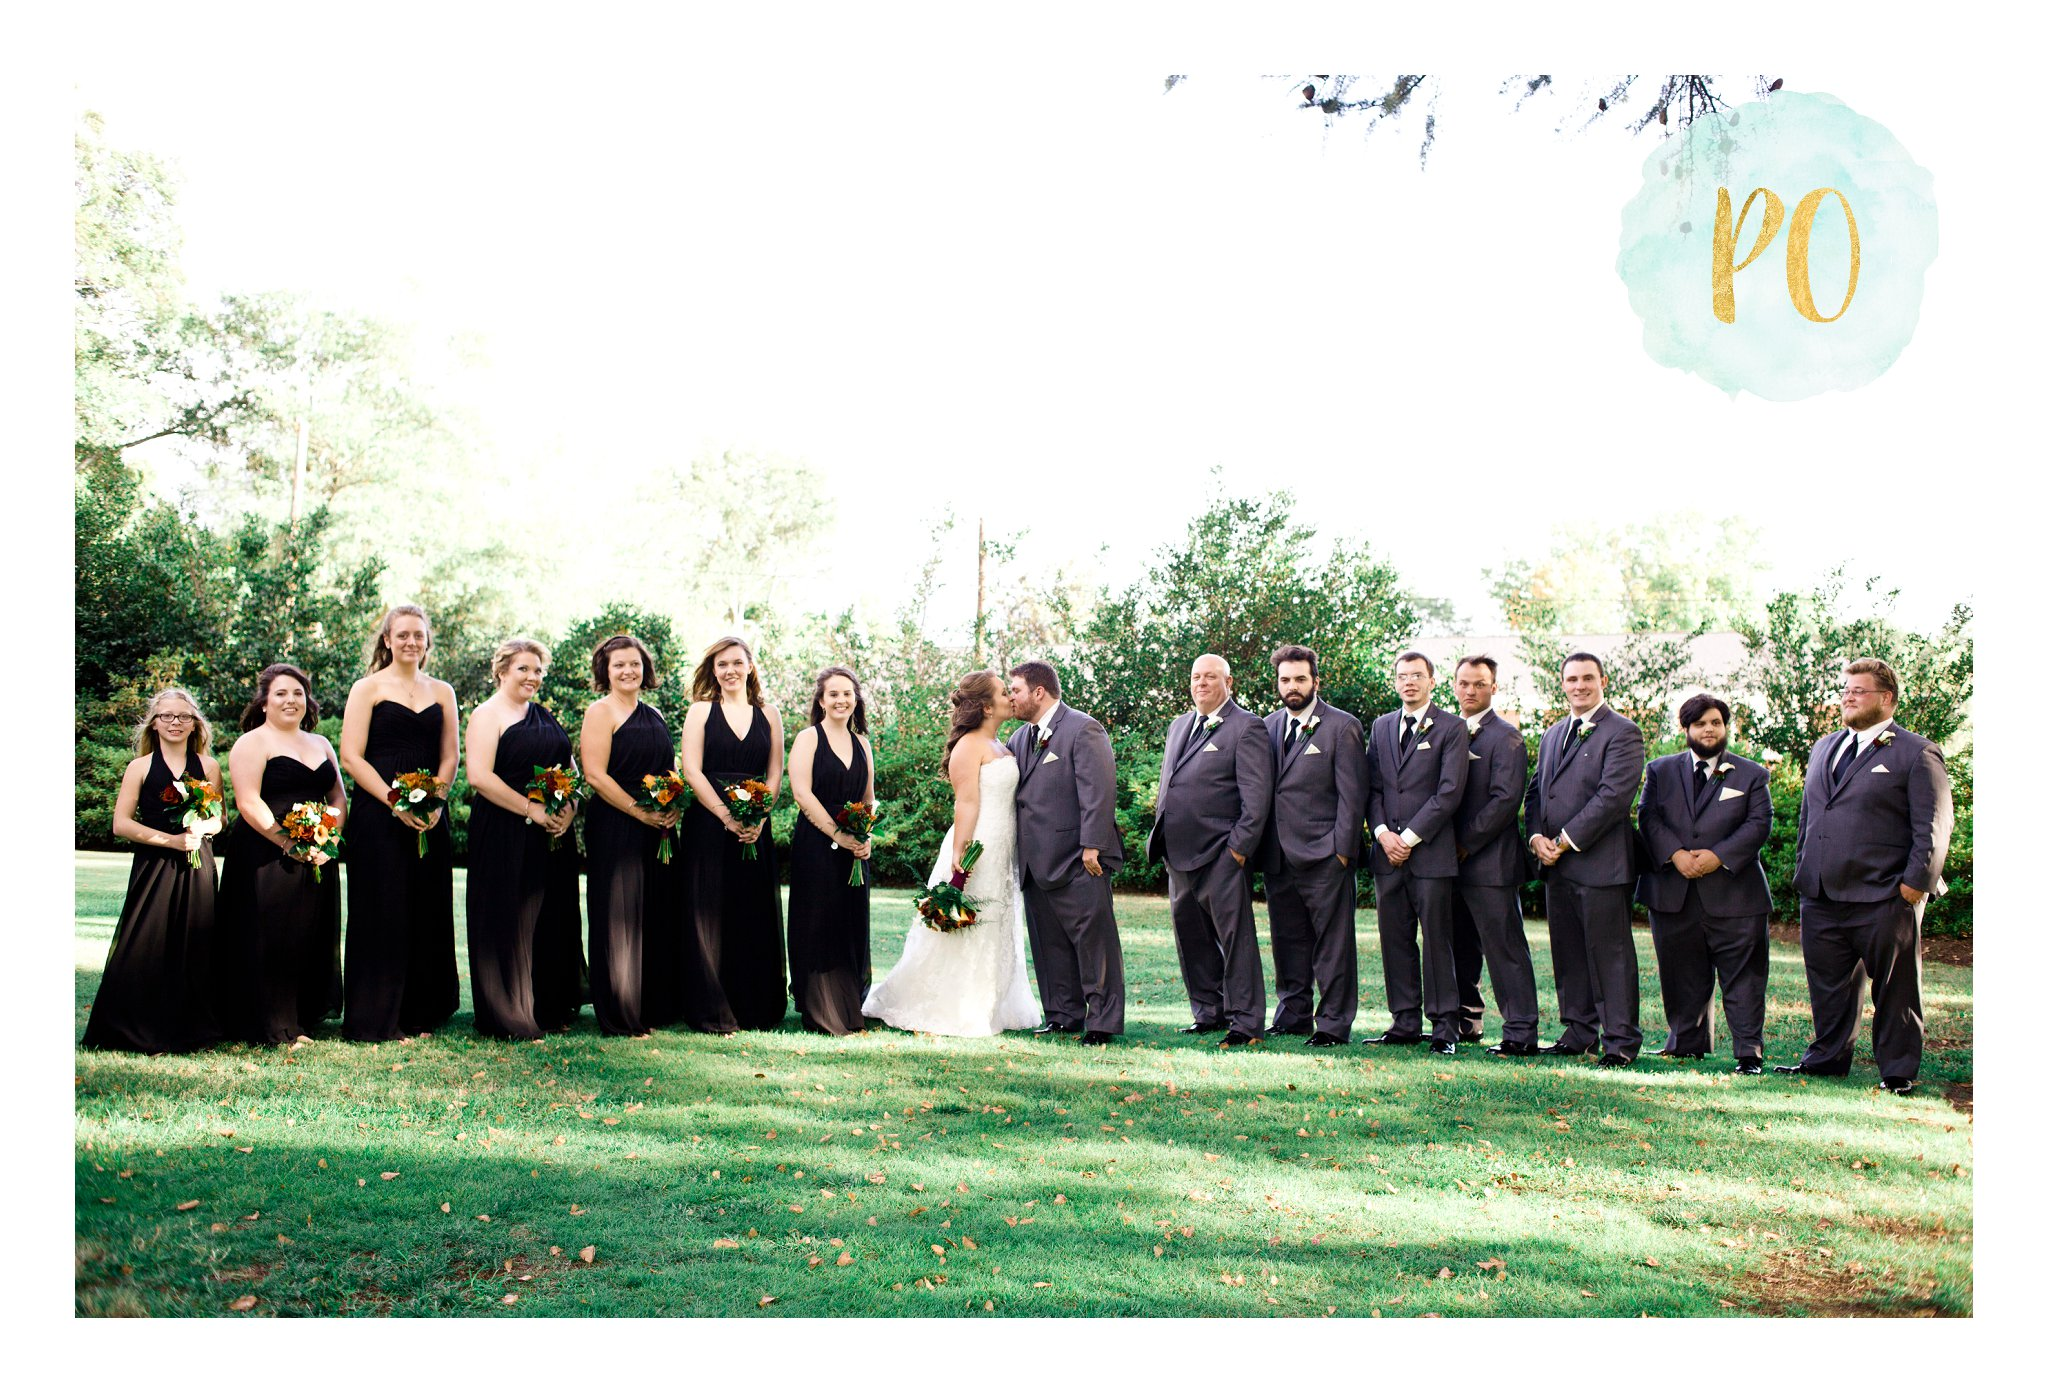 gassaway-mansion-fall-wedding-greenvile-sc-photos_0015.jpg